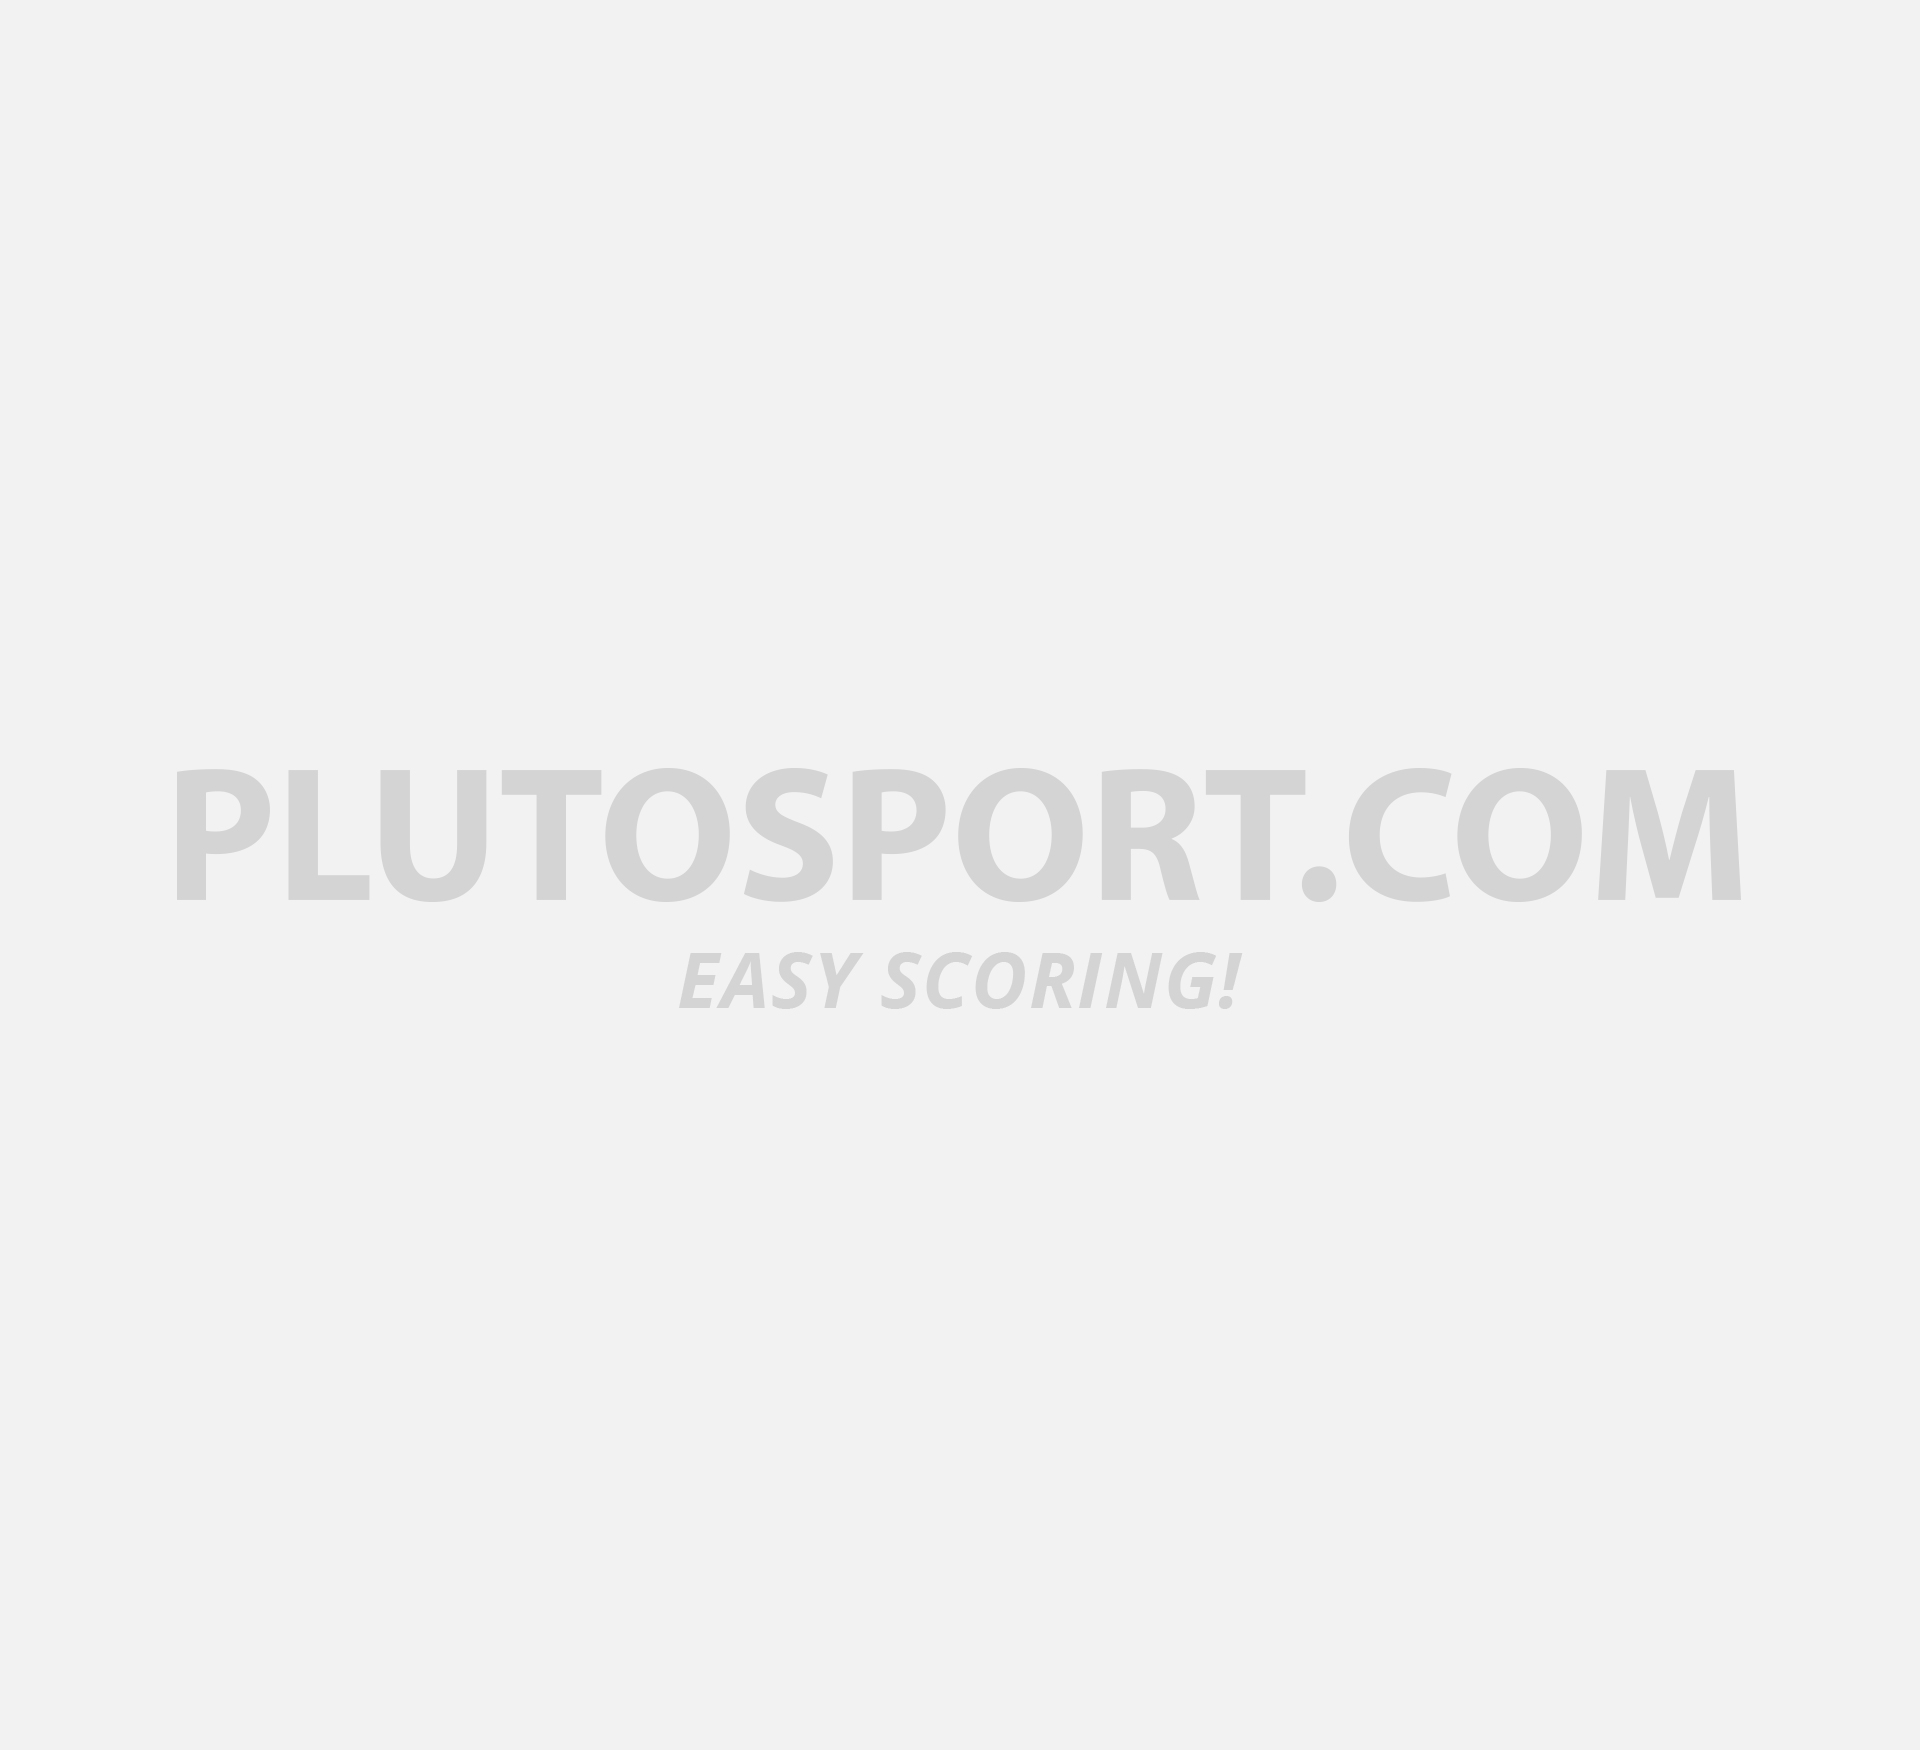 adidas kaiser 5 team turf shoes shoes football sports plutosport. Black Bedroom Furniture Sets. Home Design Ideas